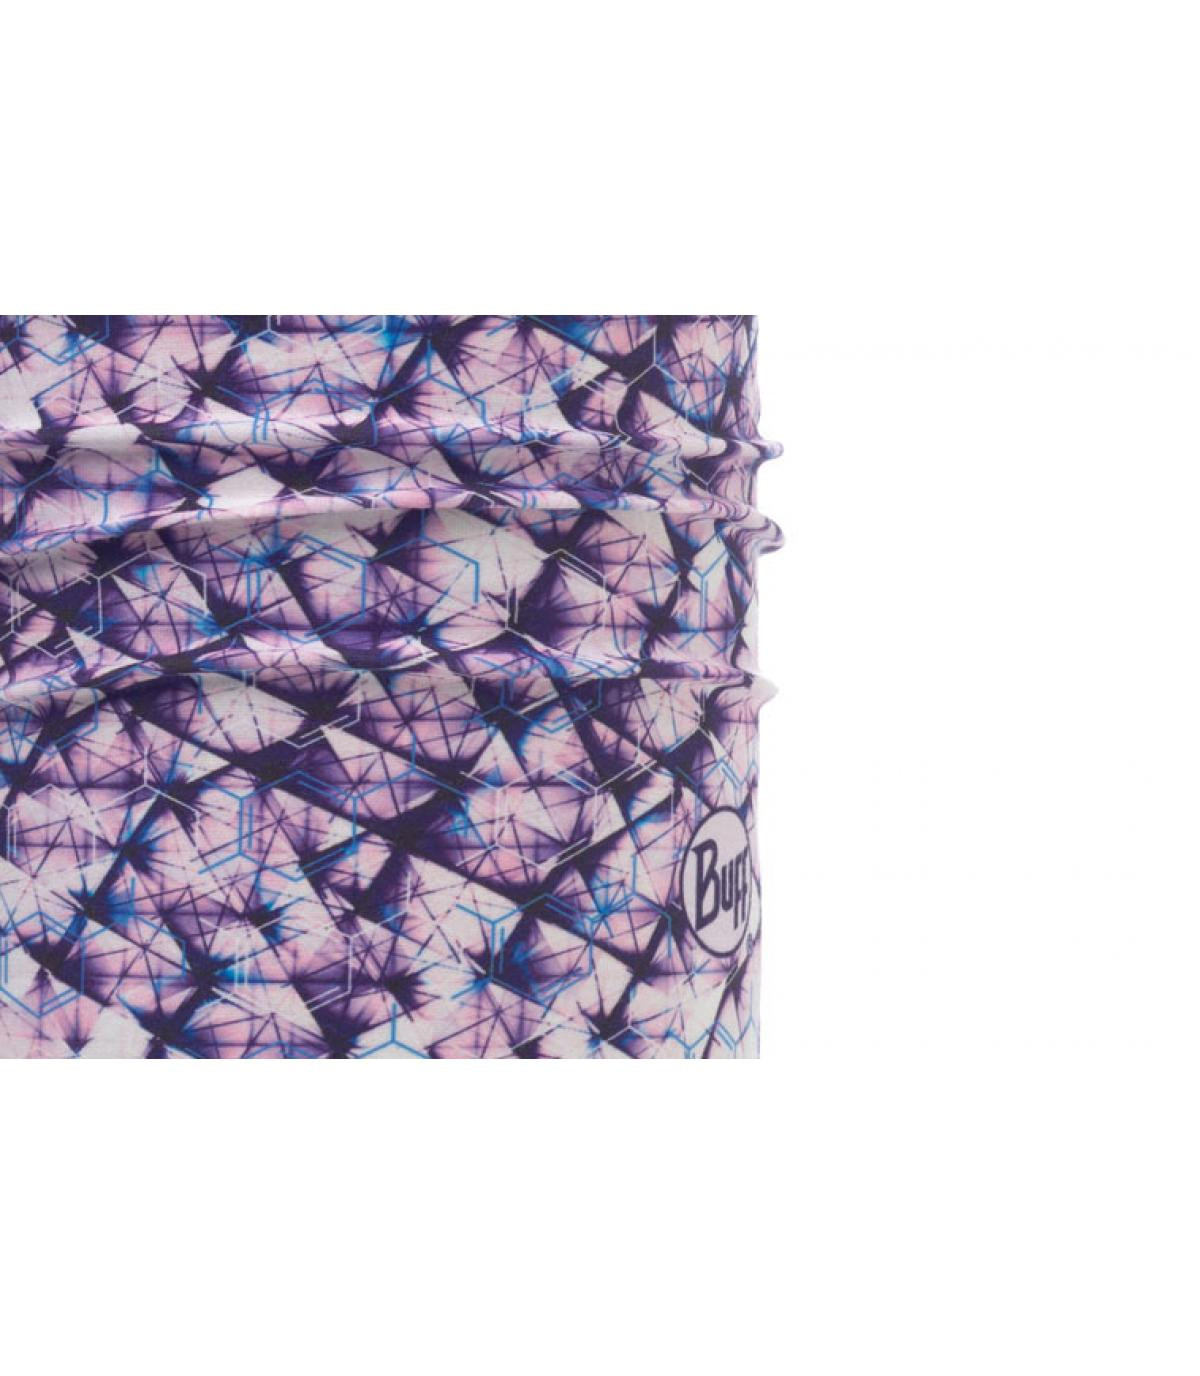 Details Perform Adren purple lilac - Abbildung 2